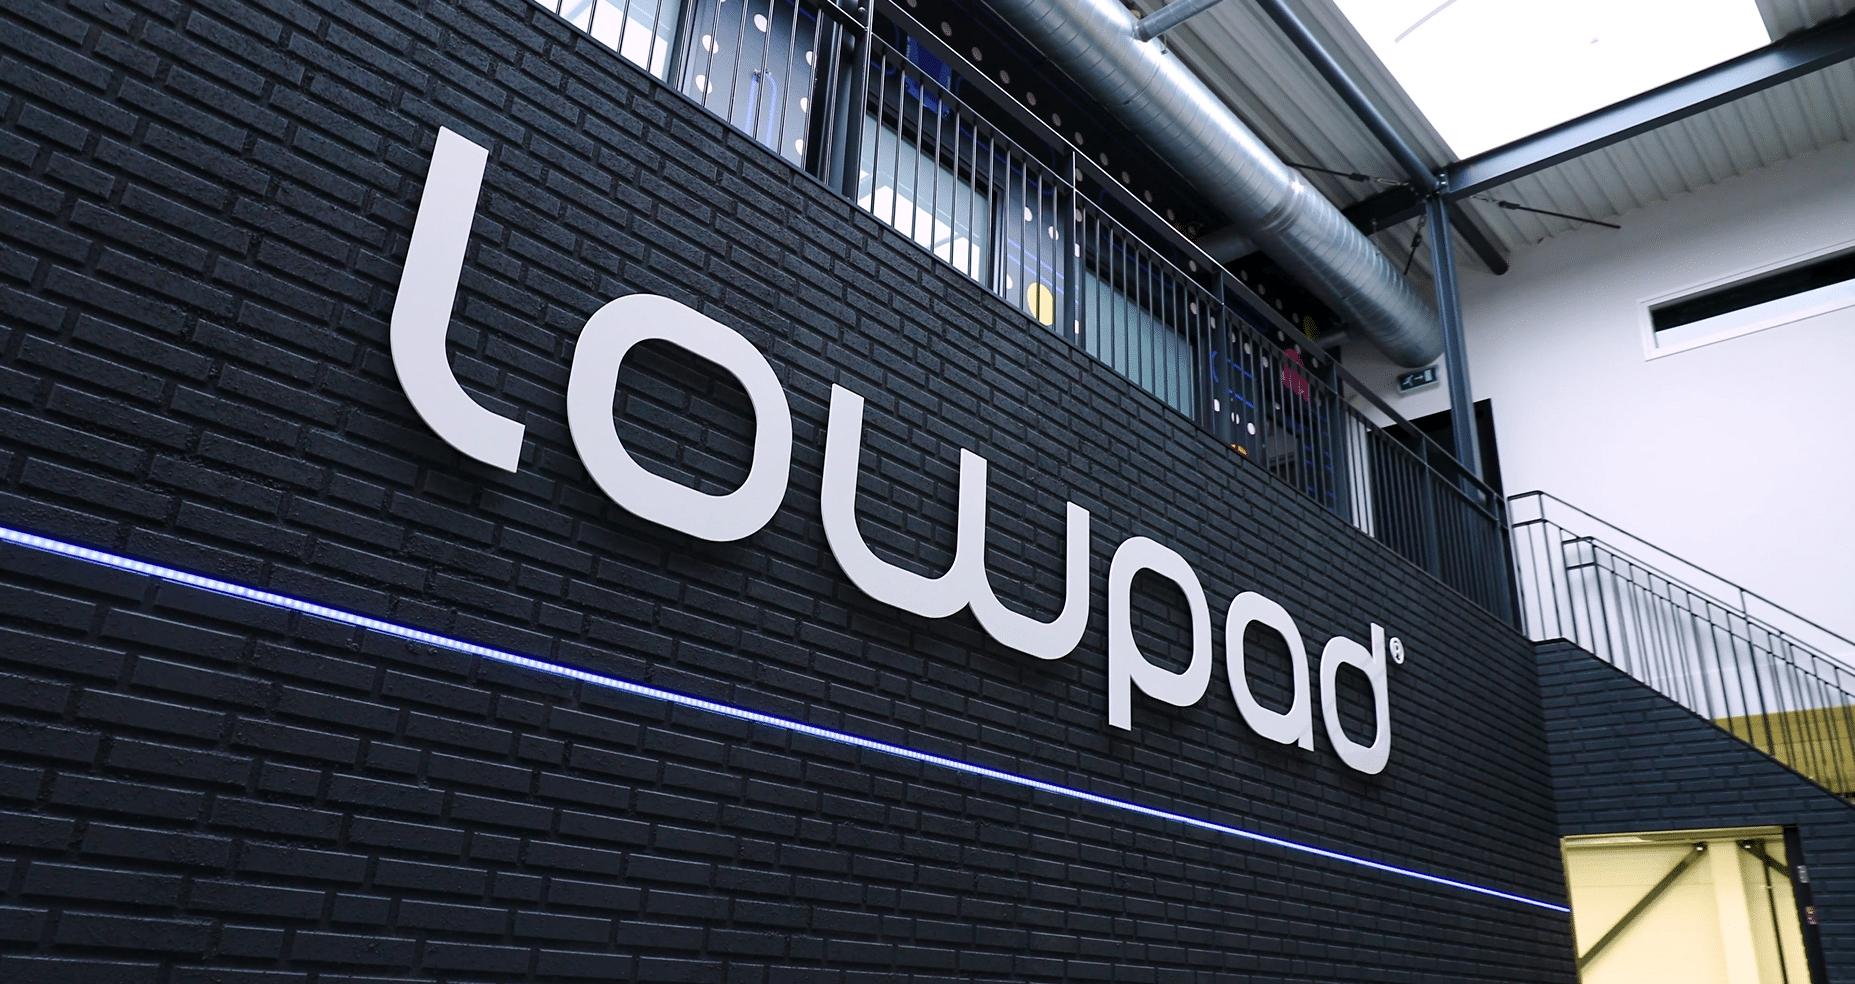 lowpad experience center